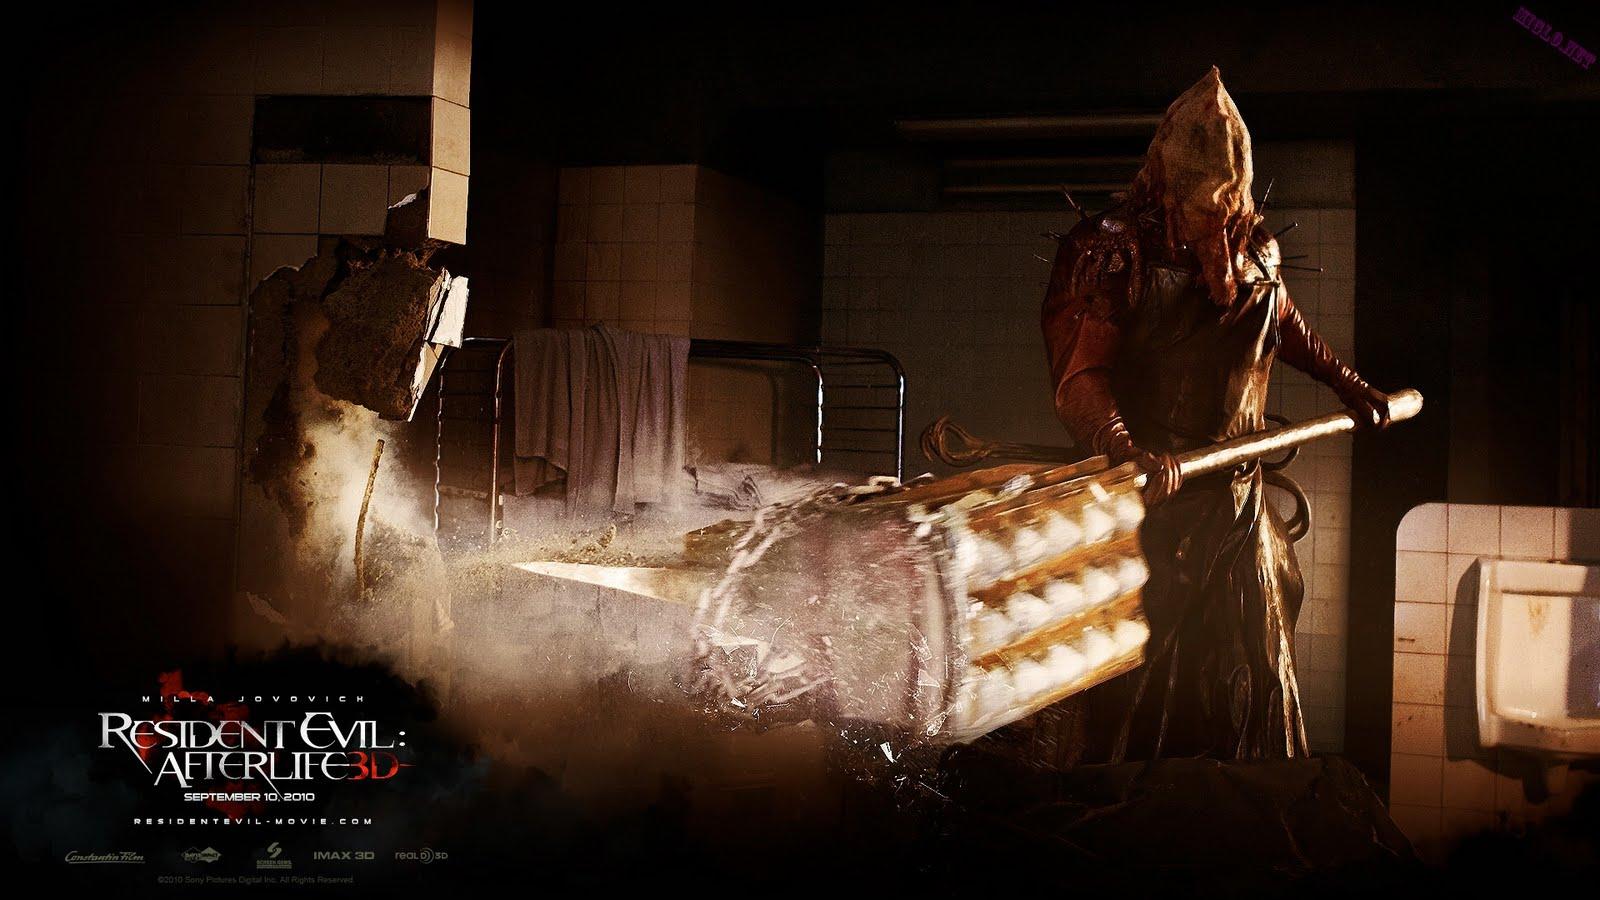 http://3.bp.blogspot.com/_V6TVDECge74/TFBtUTVf7RI/AAAAAAAAAws/_bnthejTK4I/s1600/Ray_Olubowale_in_Resident_Evil-_Afterlife_Wallpaper%2BHD.jpg